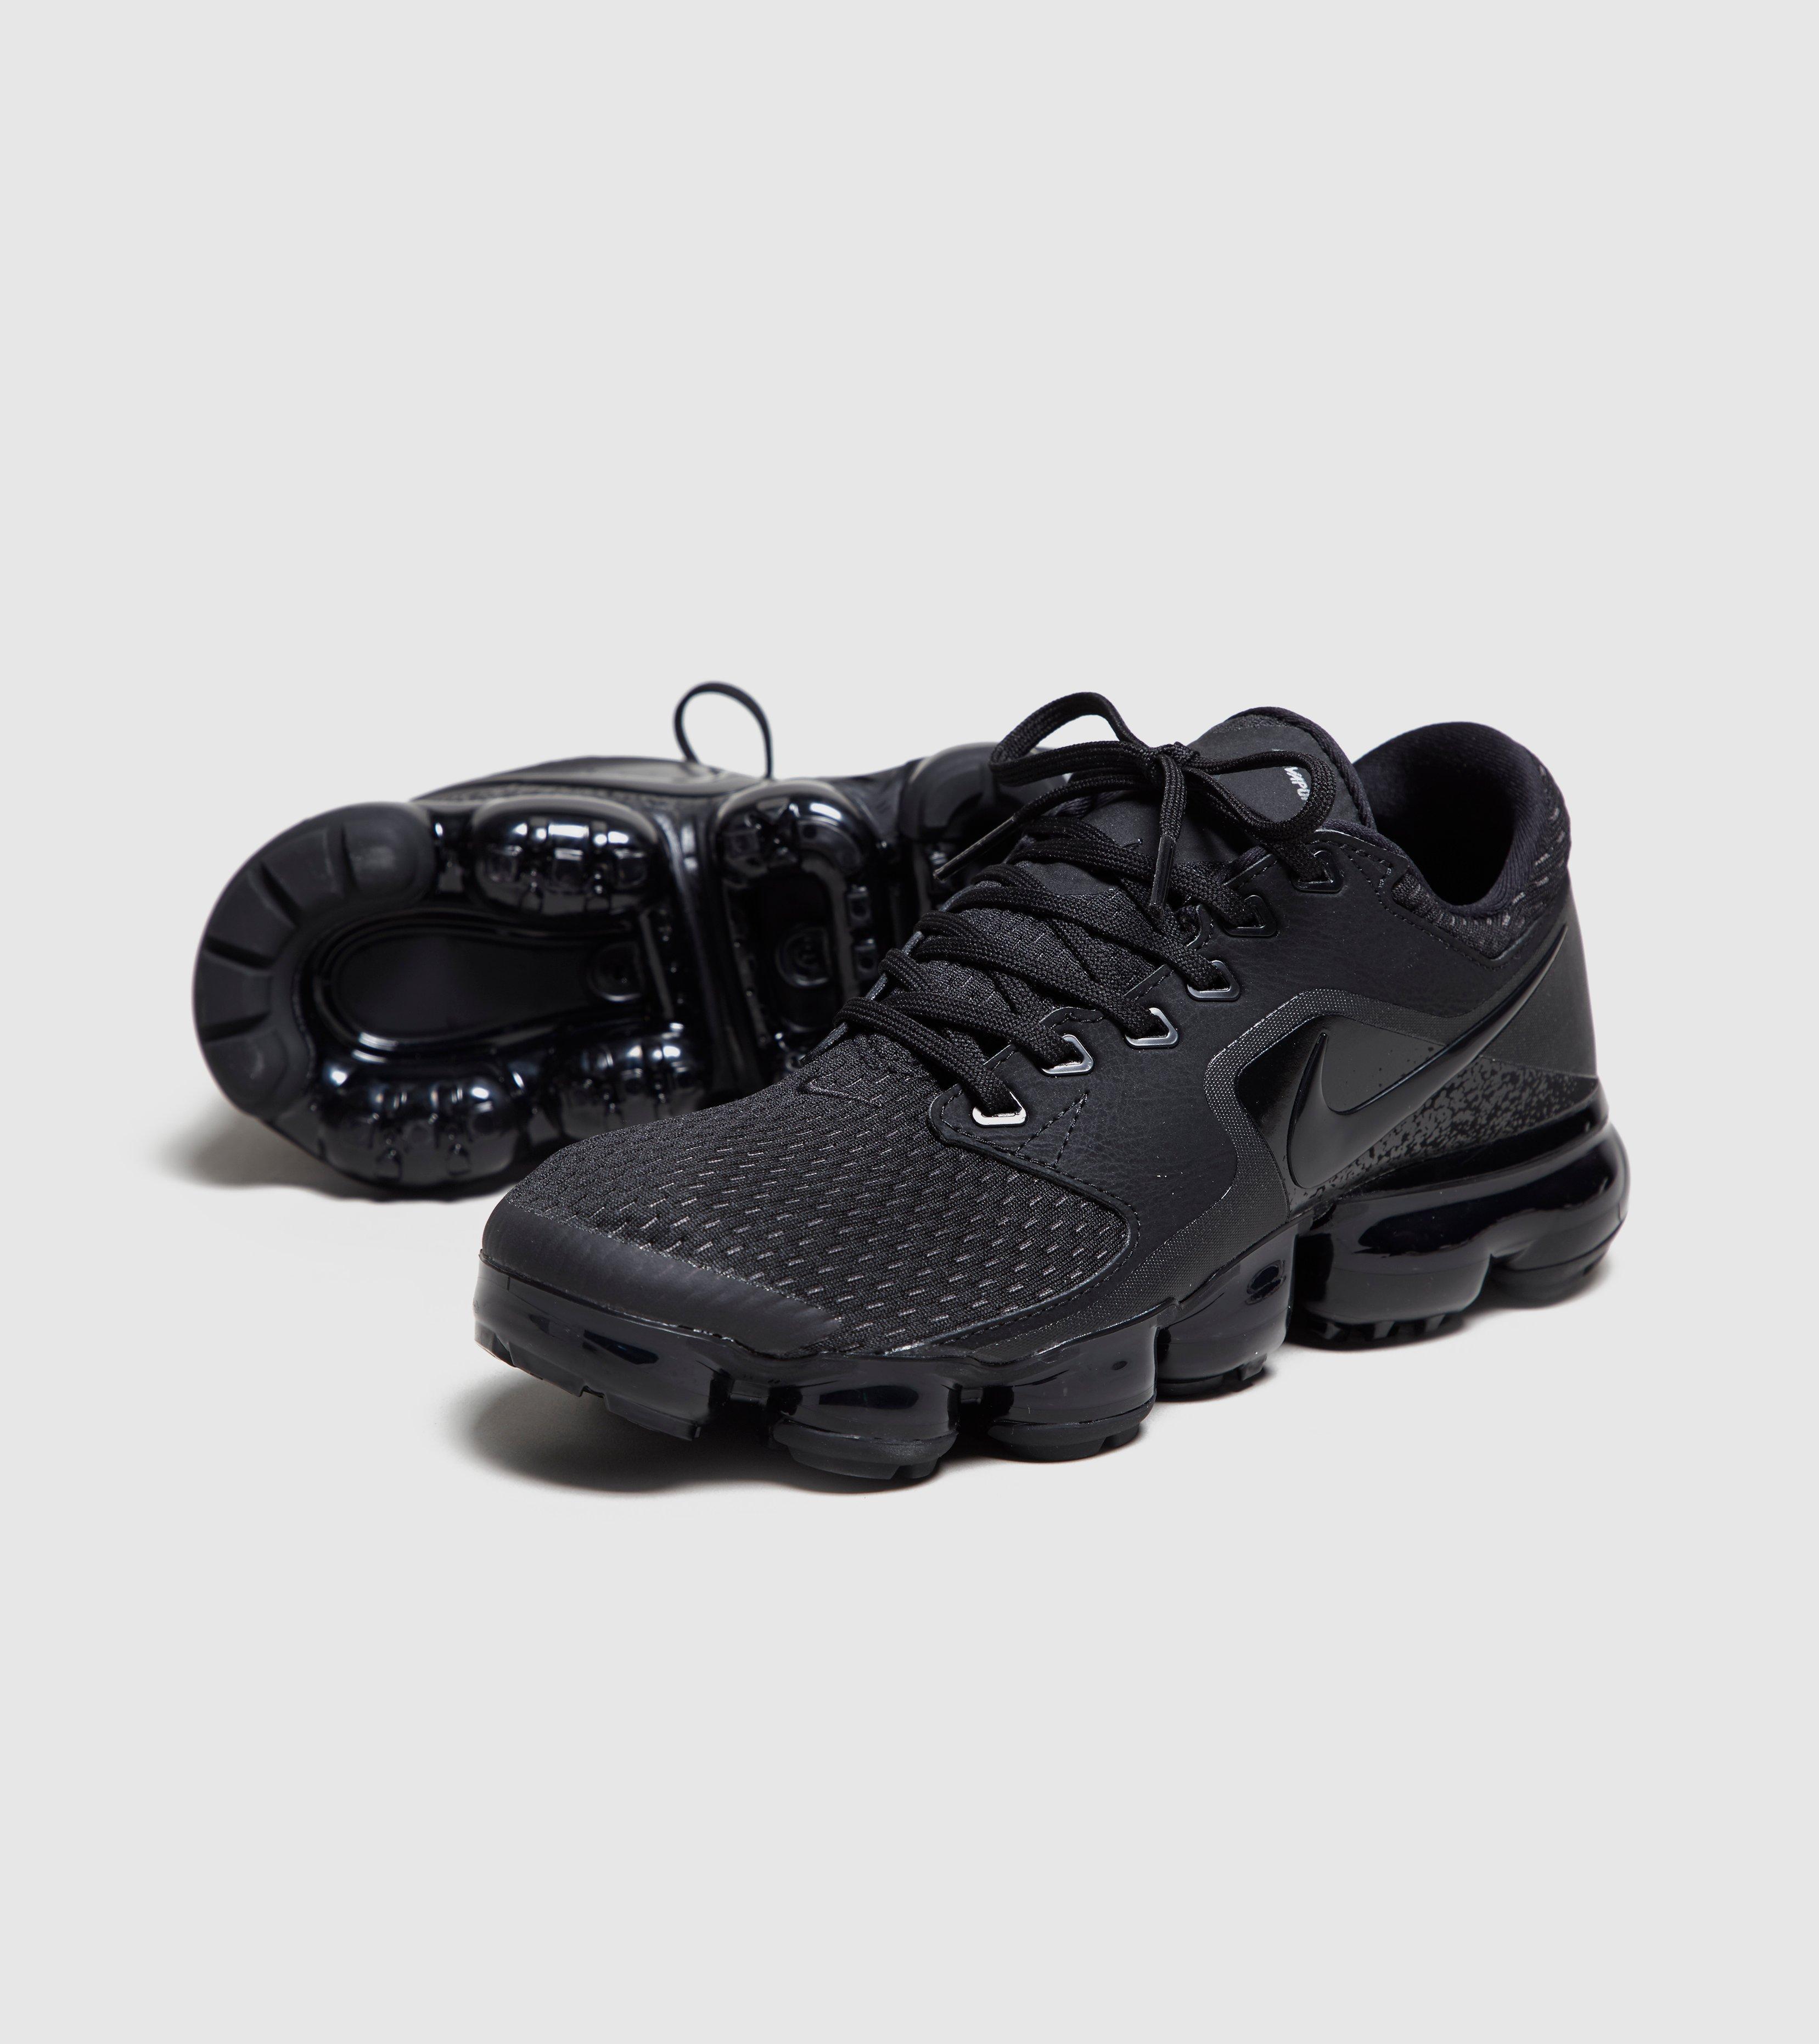 Nike Air Vapormax Womens Black